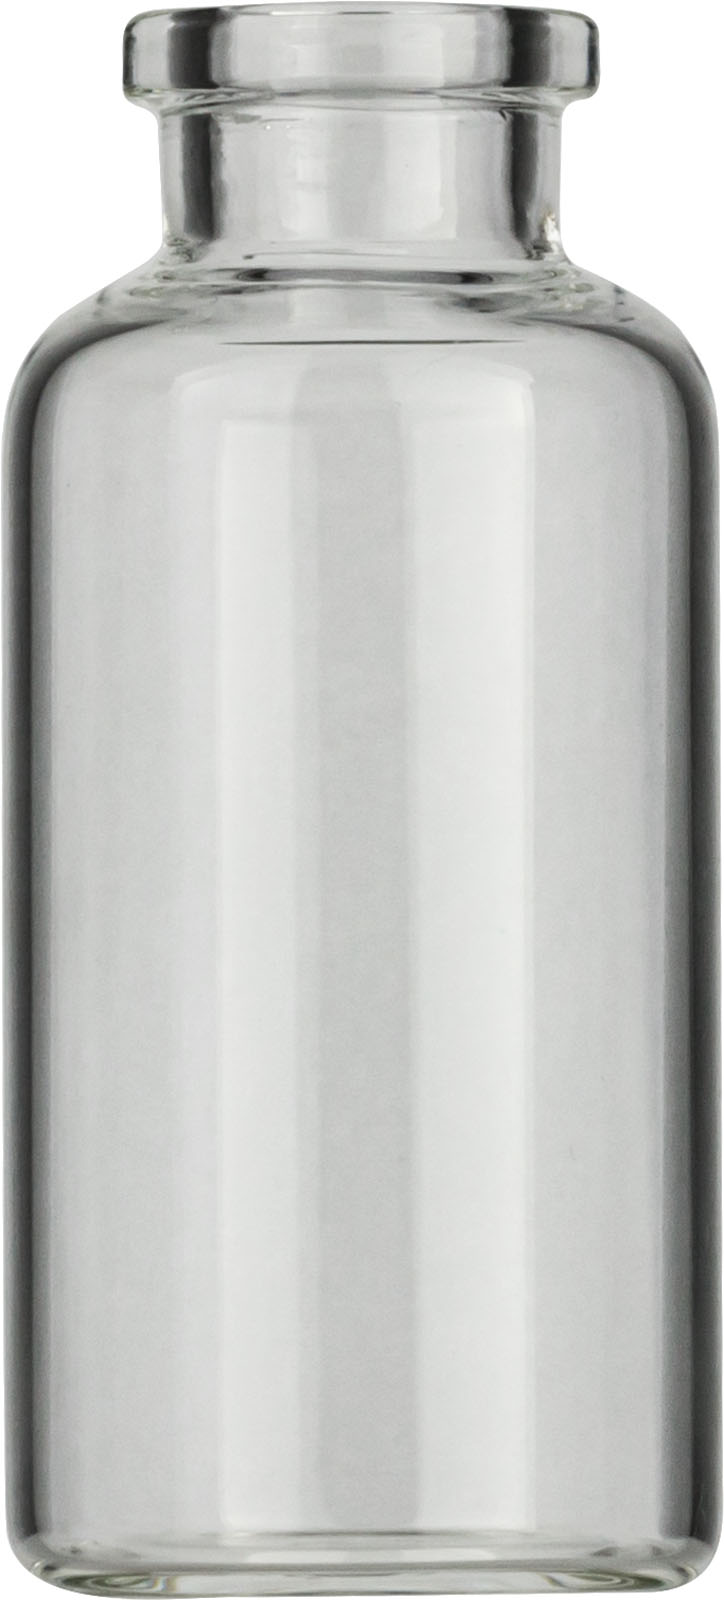 Vial N20-25, RR, k, 30x65, fl., DIN